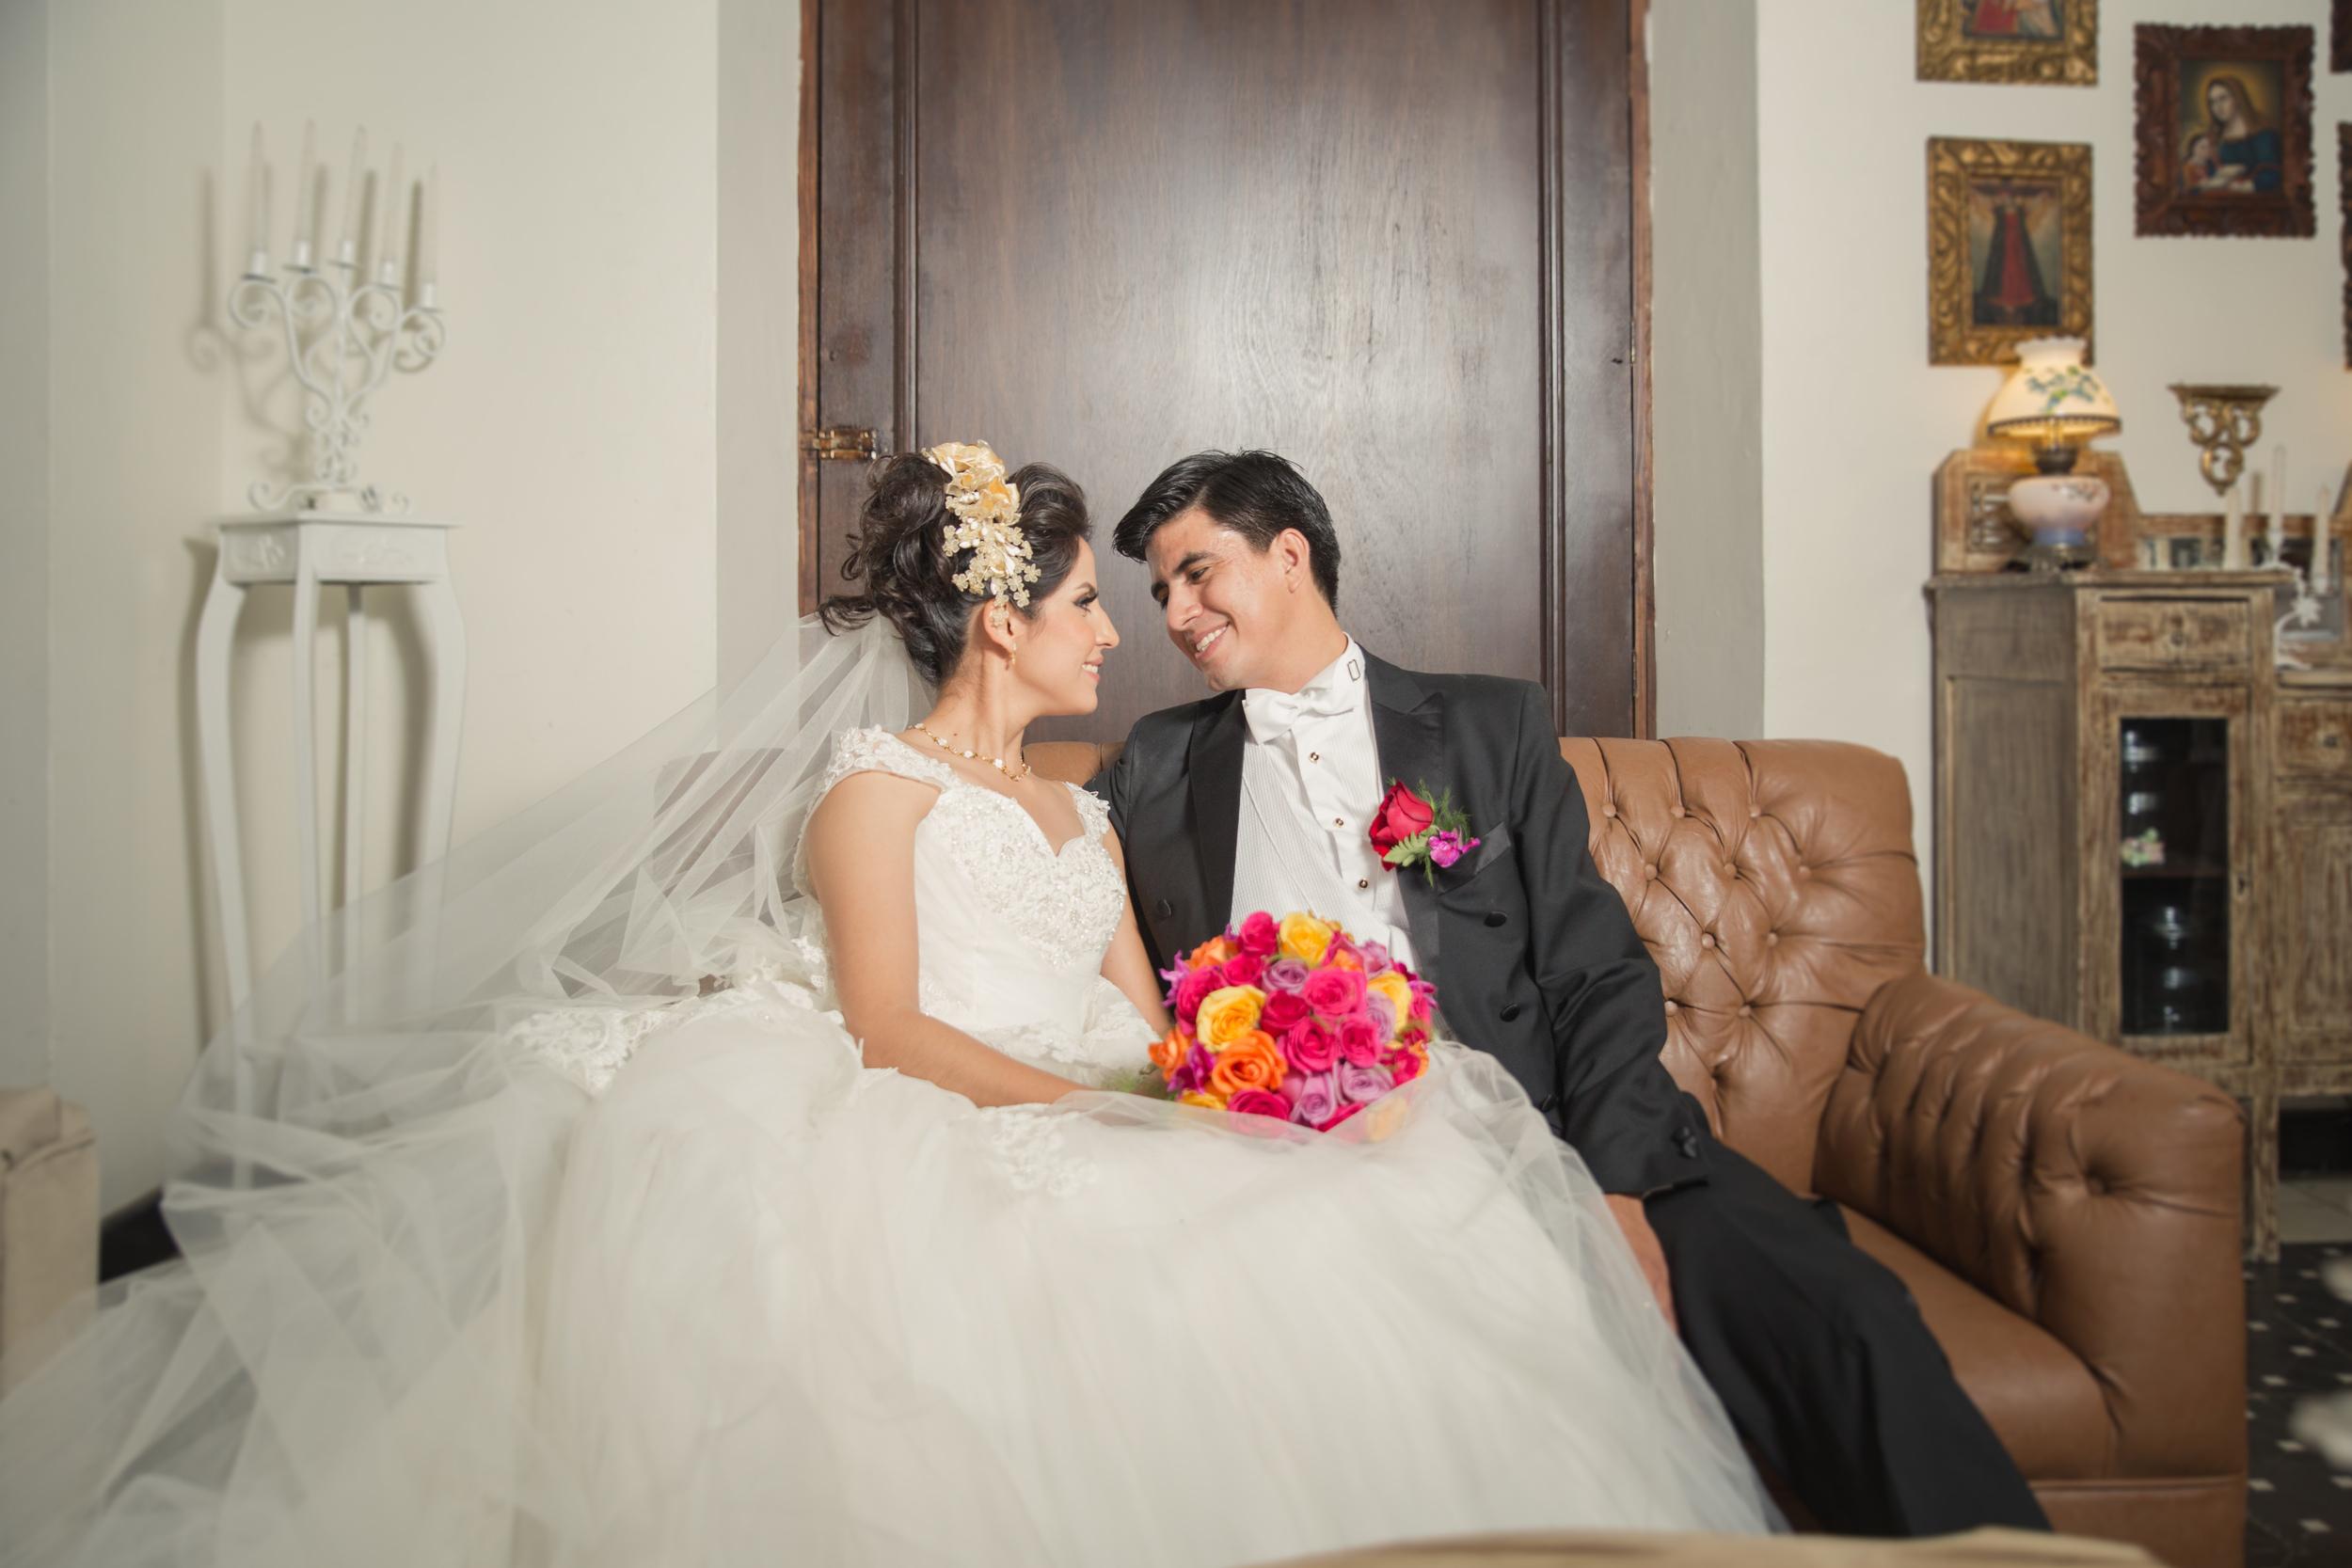 fotografia de boda guadalajara 2 clasica